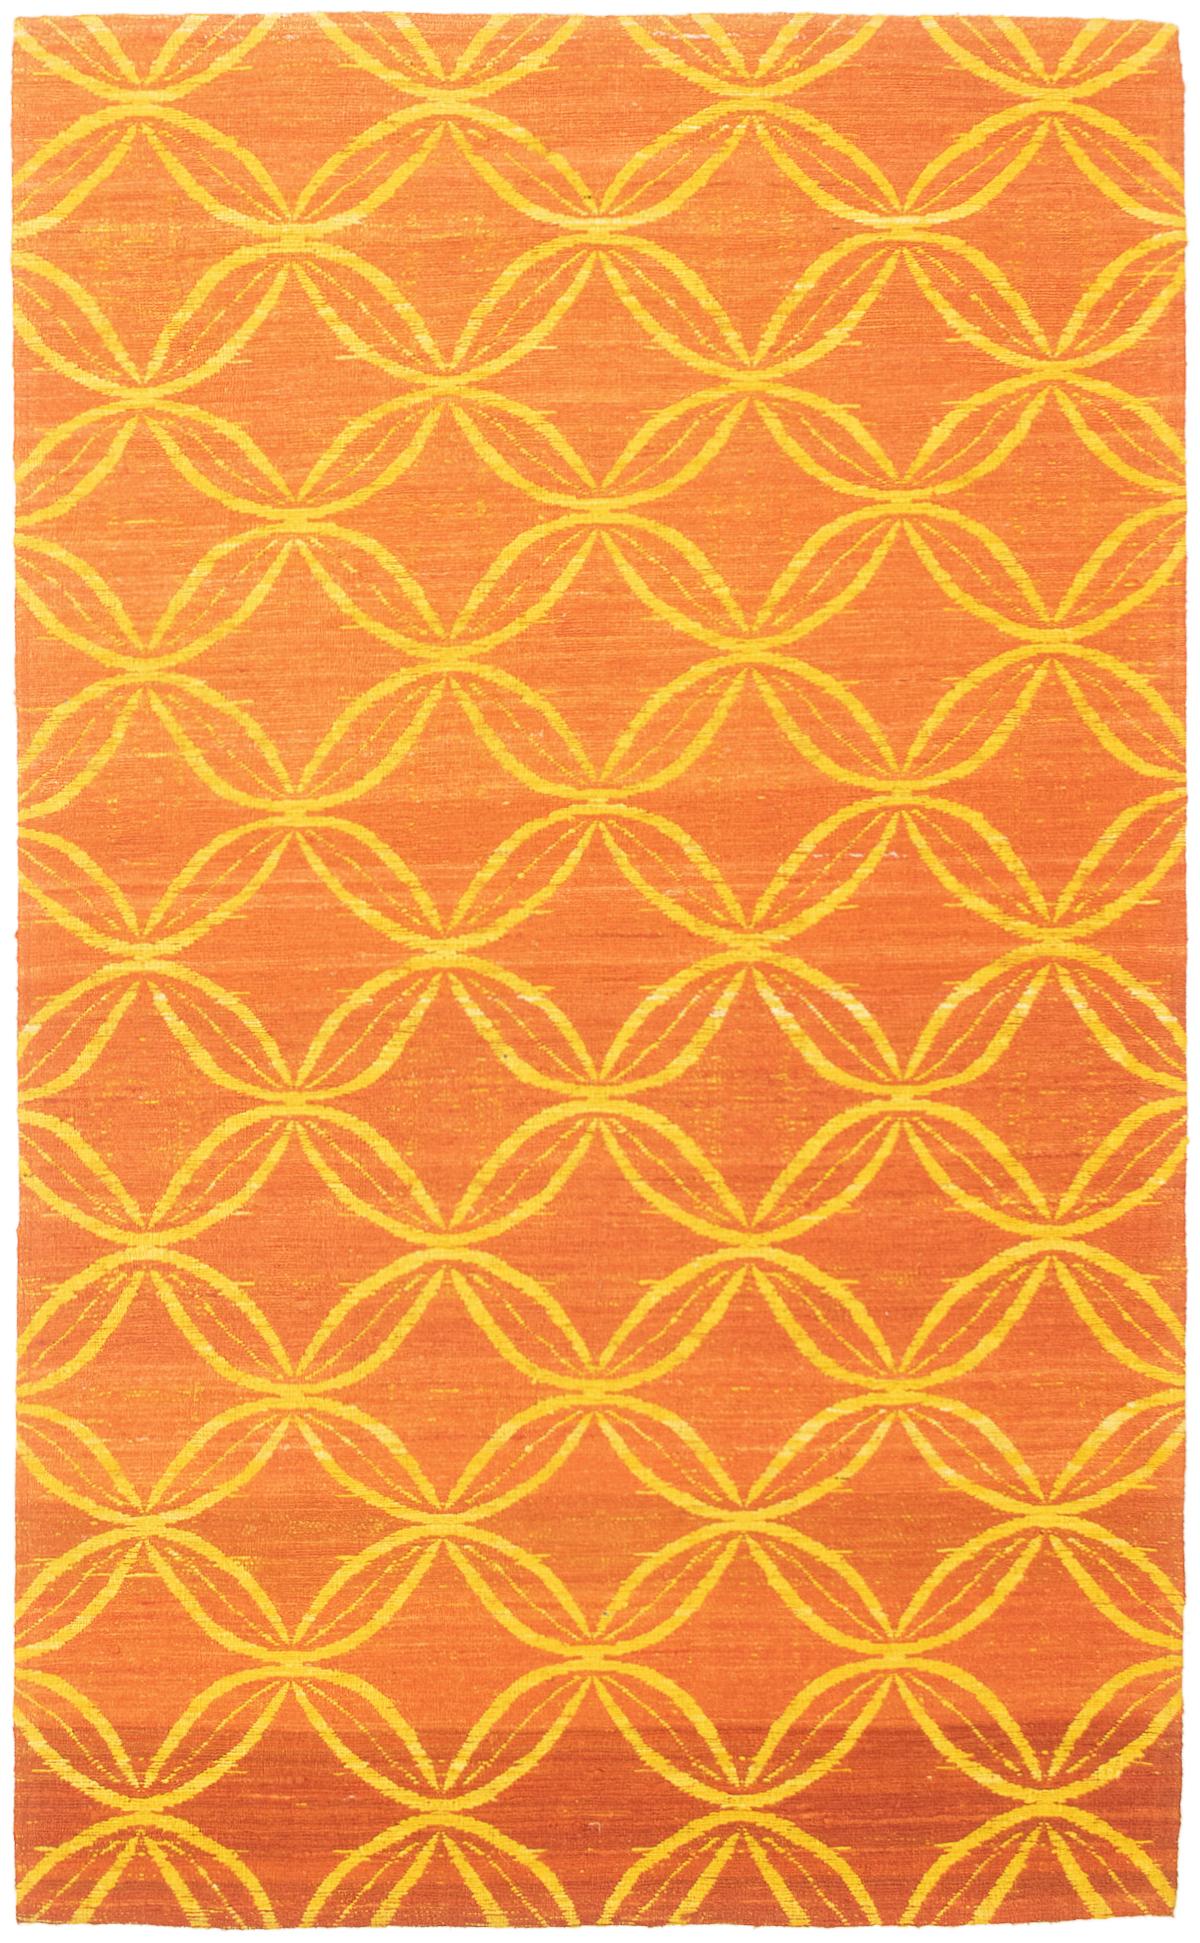 "Handmade Collage Burnt Orange Chenille Rug 4'11"" x 8'0"" Size: 4'11"" x 8'0"""